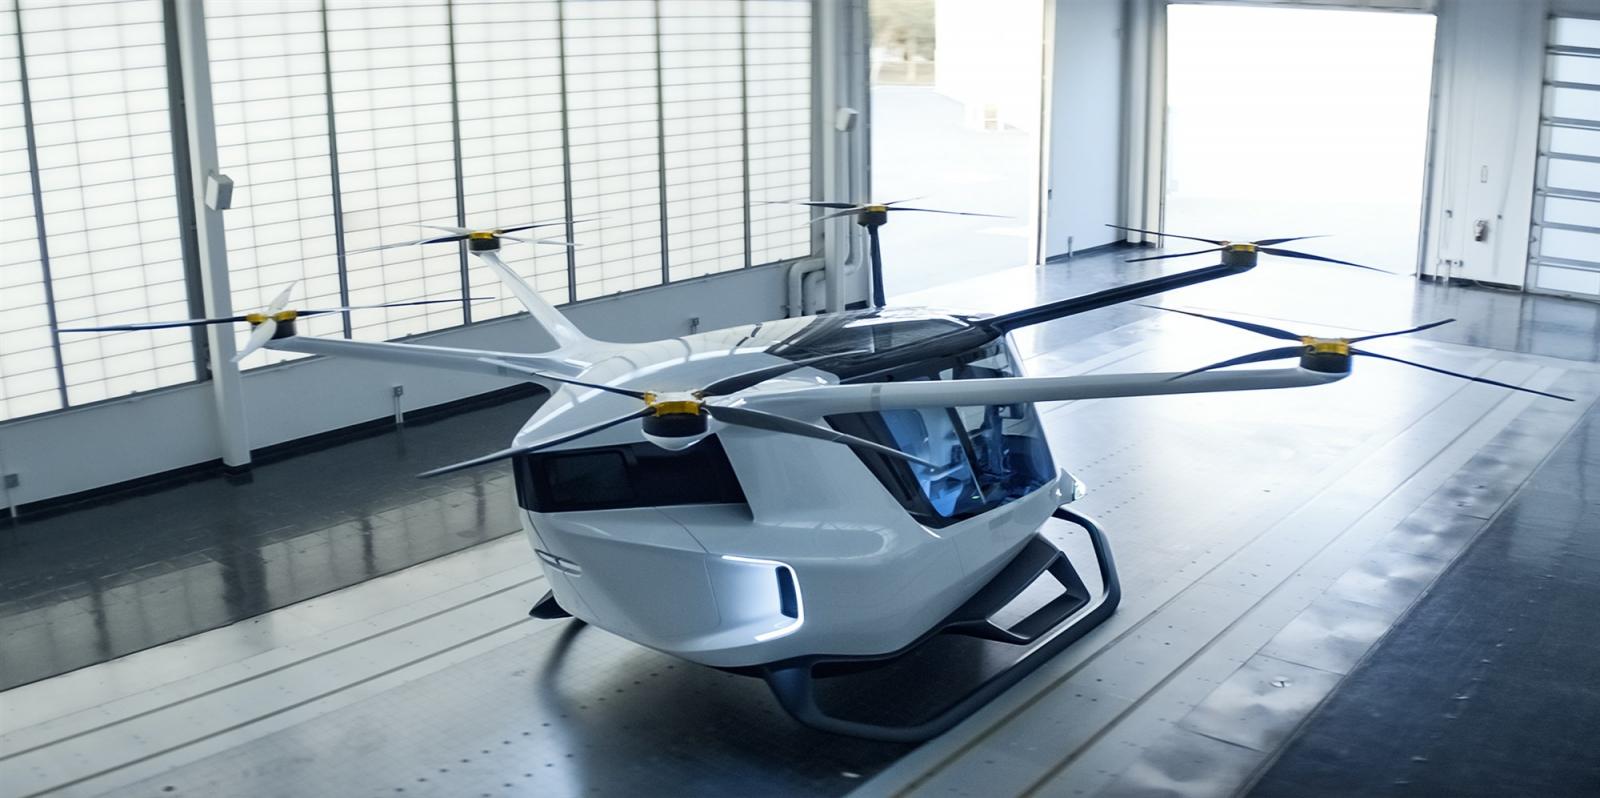 El vehicle volador d'hidrogen Skai